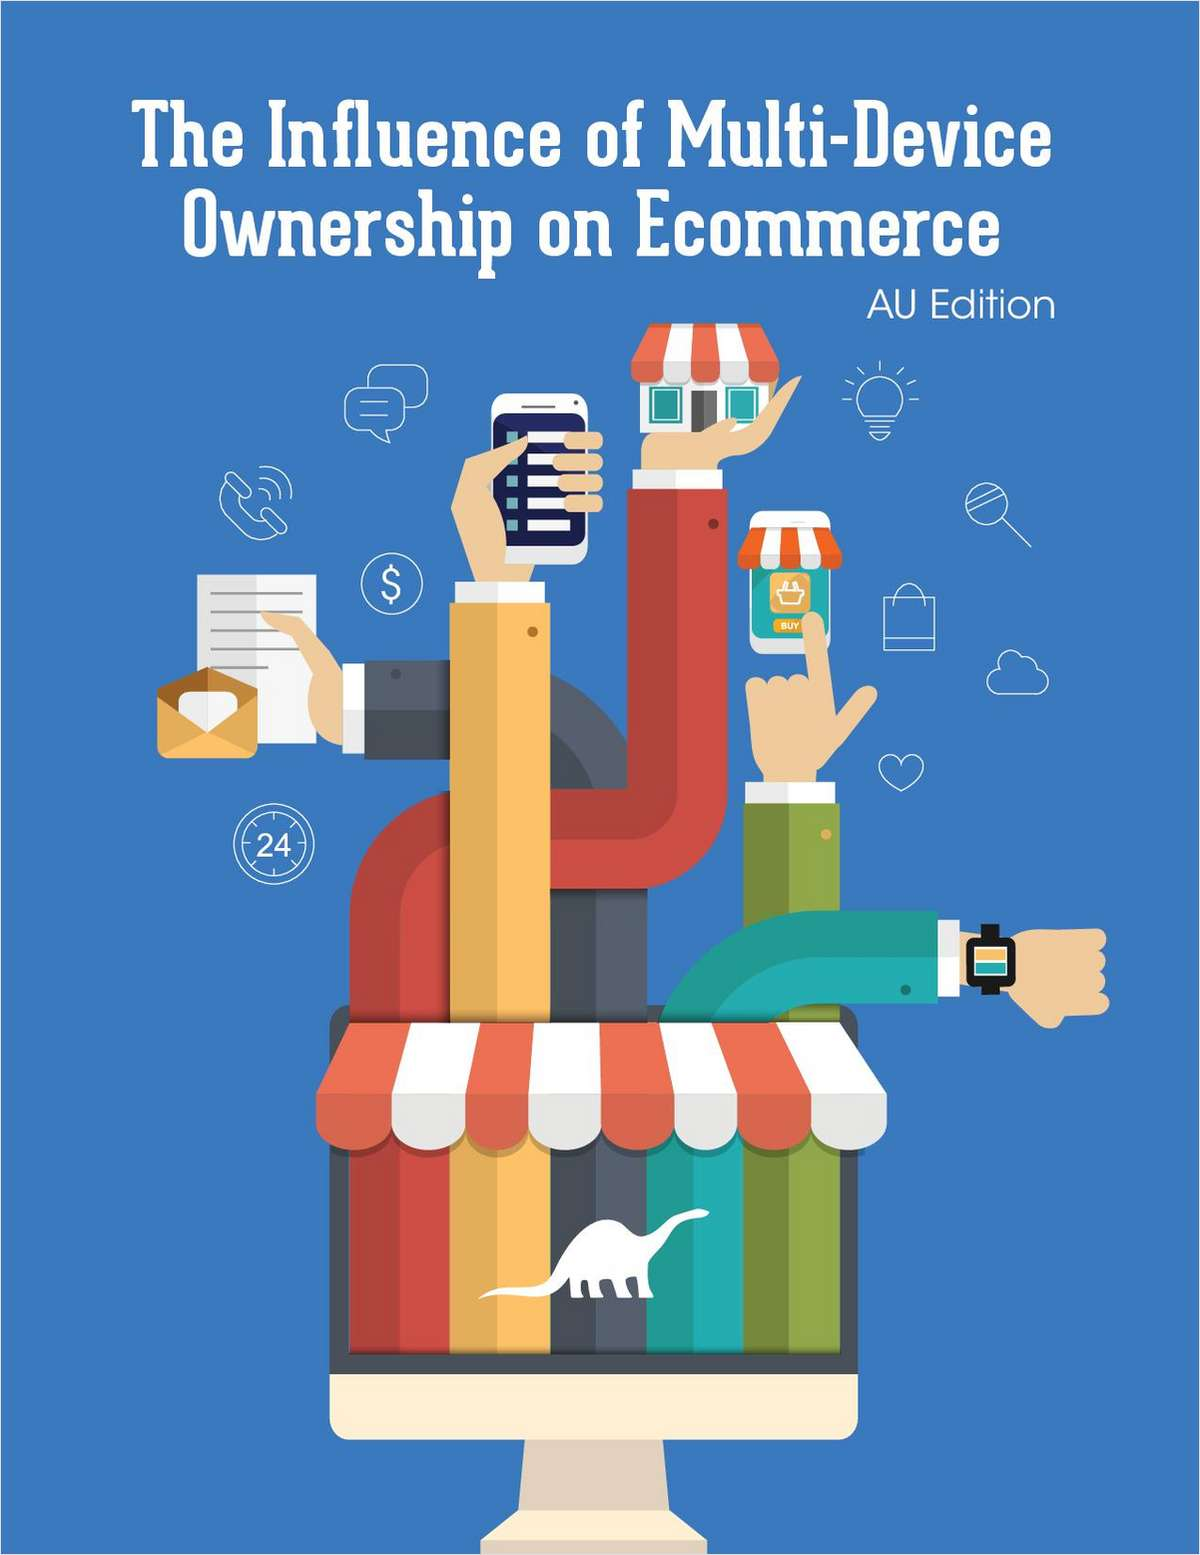 Ecommerce Shopping Behaviour of Australian Consumers